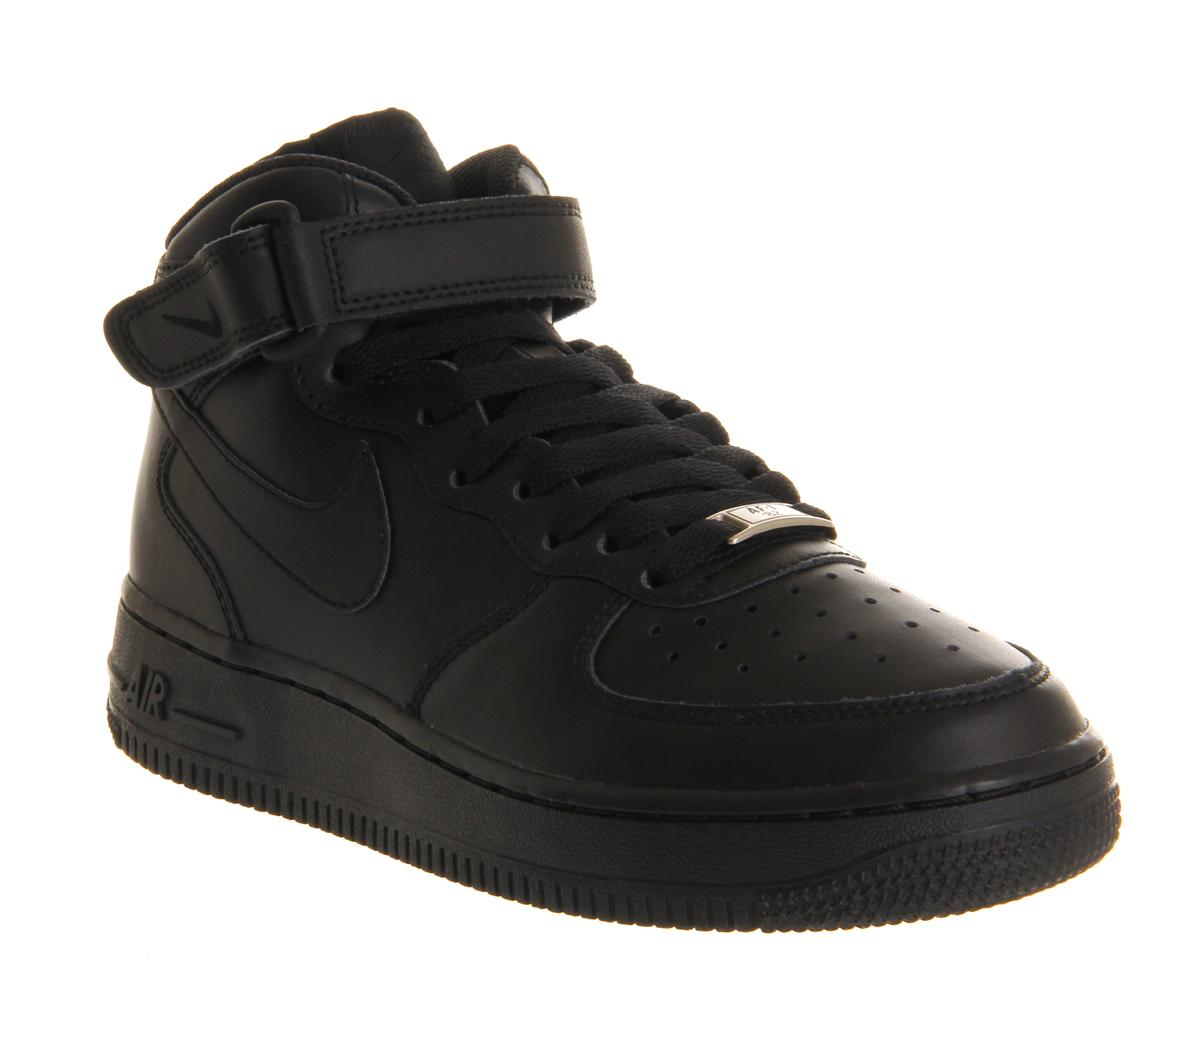 Nike Air Force 1 Mid Black - Kids Trainers